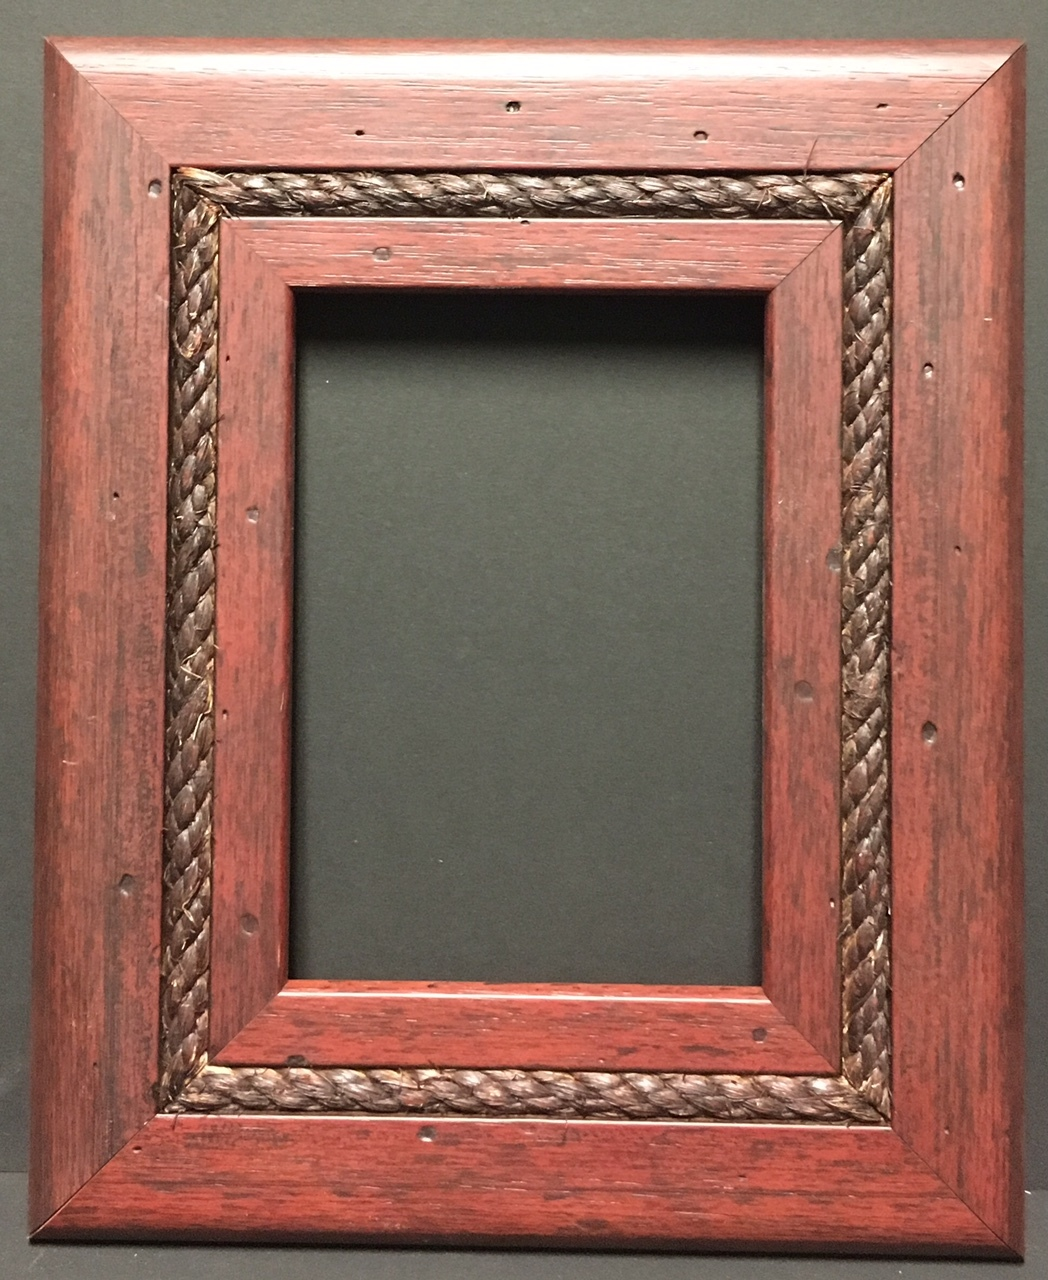 f026 16 x 20 2 1 2 mahogany rope picture frame frames. Black Bedroom Furniture Sets. Home Design Ideas